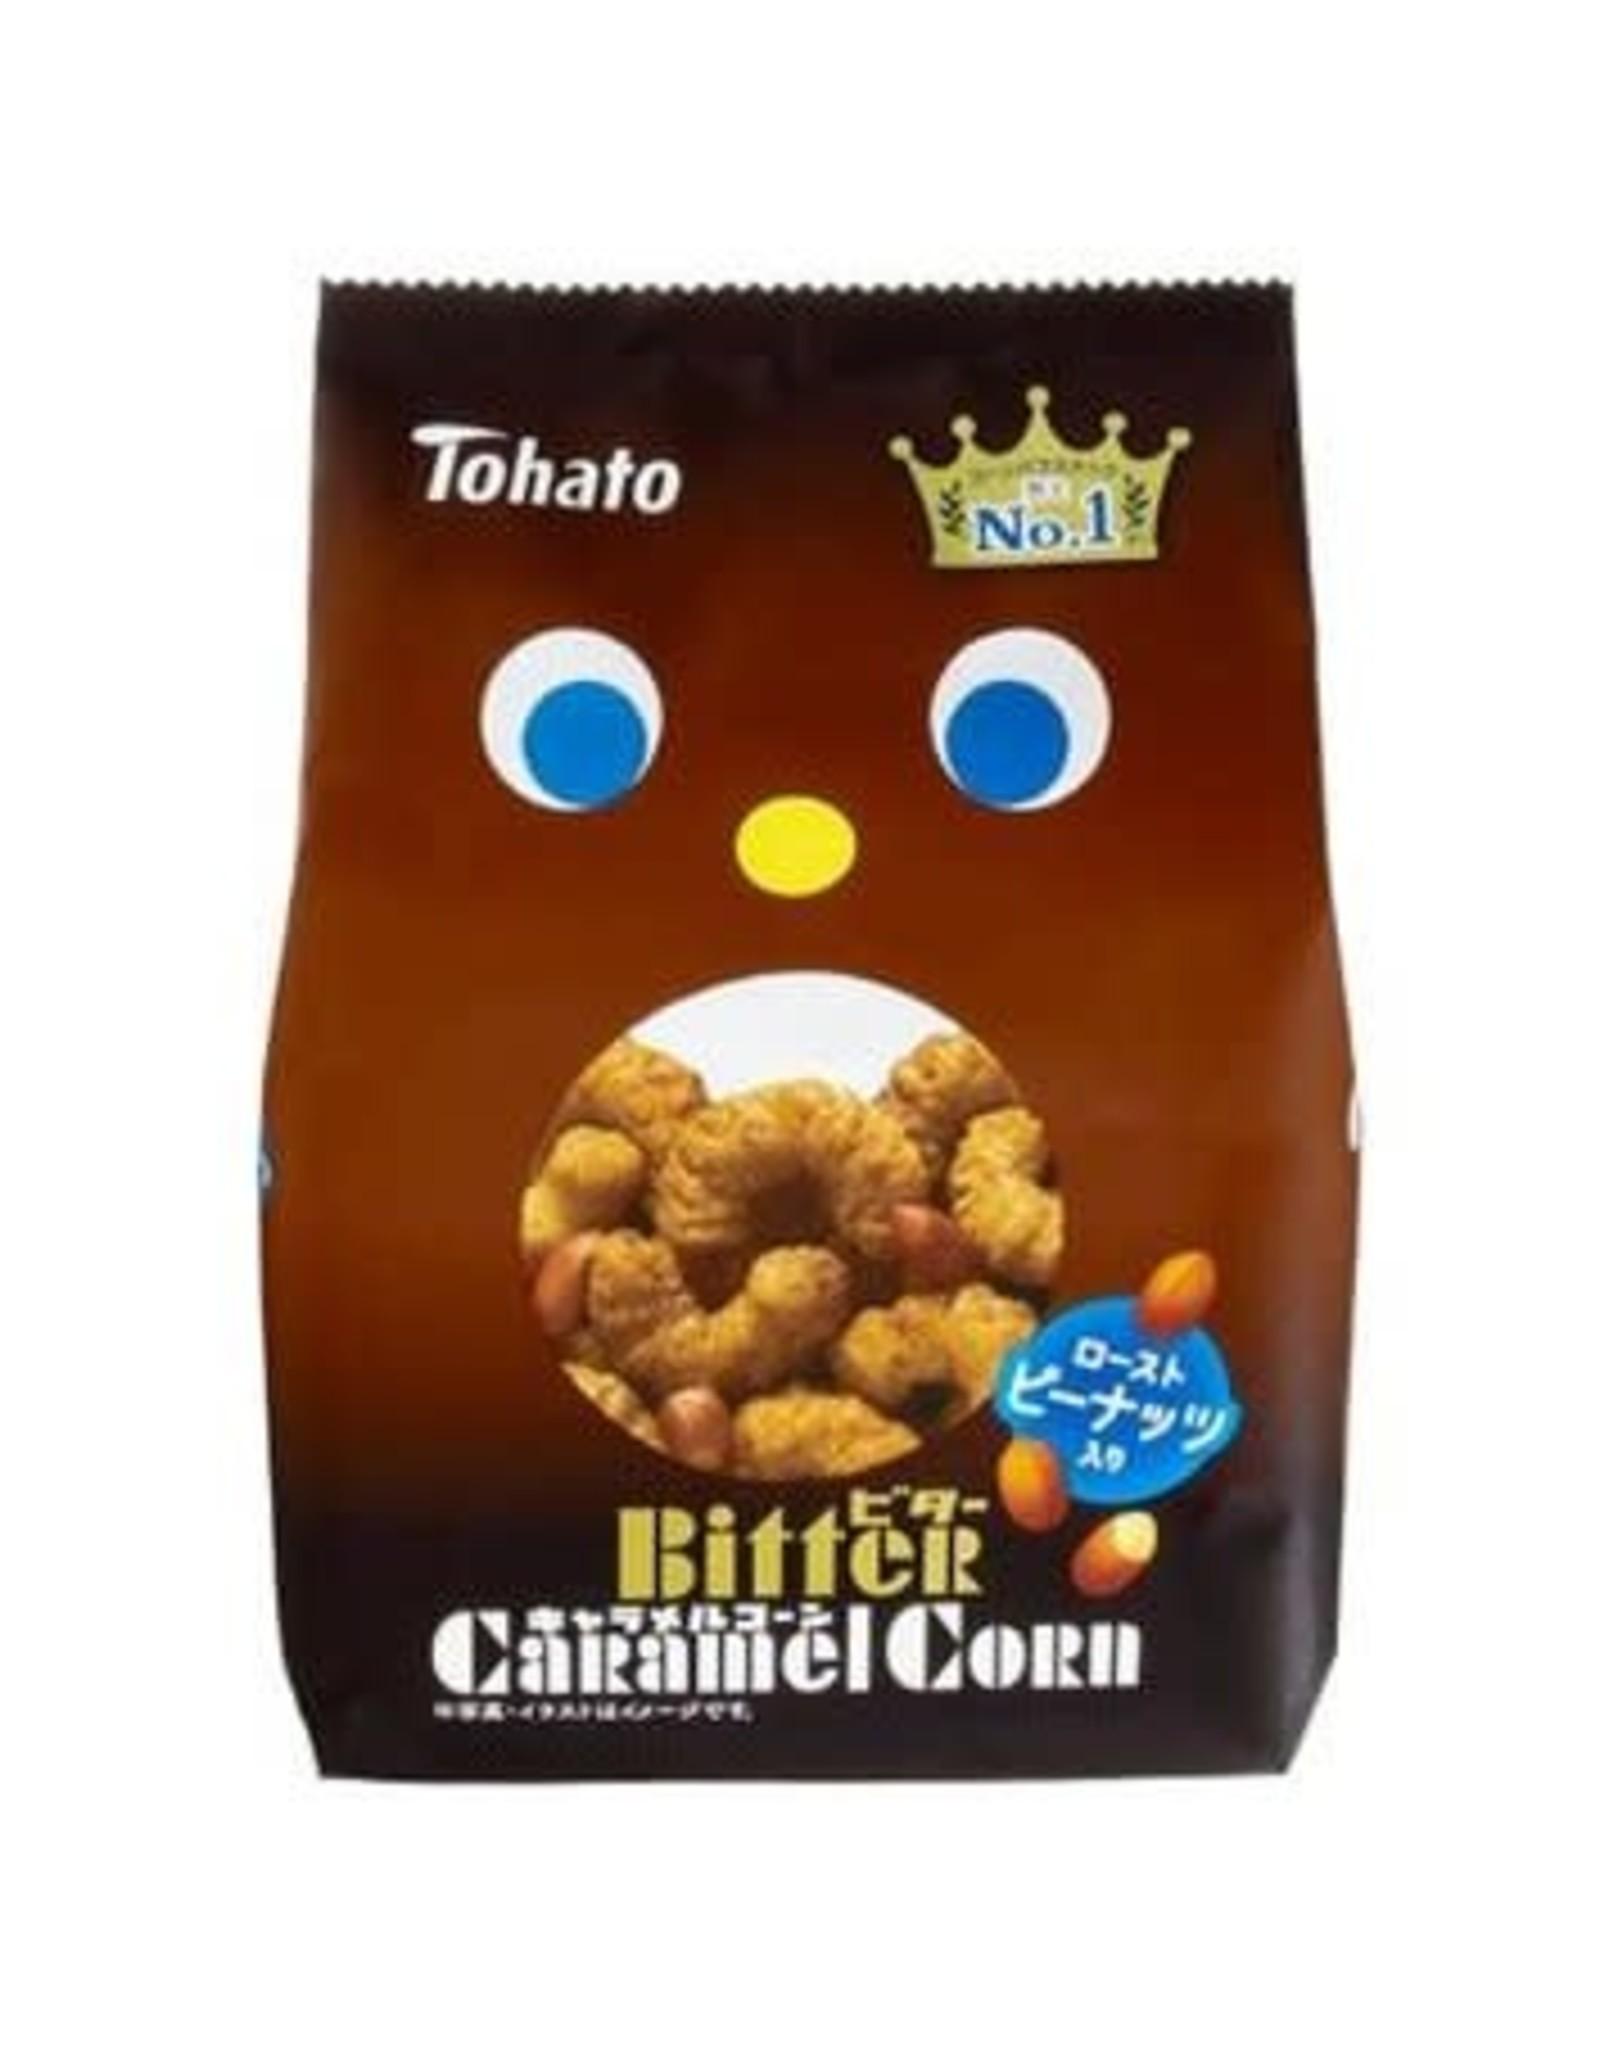 Caramel Corn Bitter